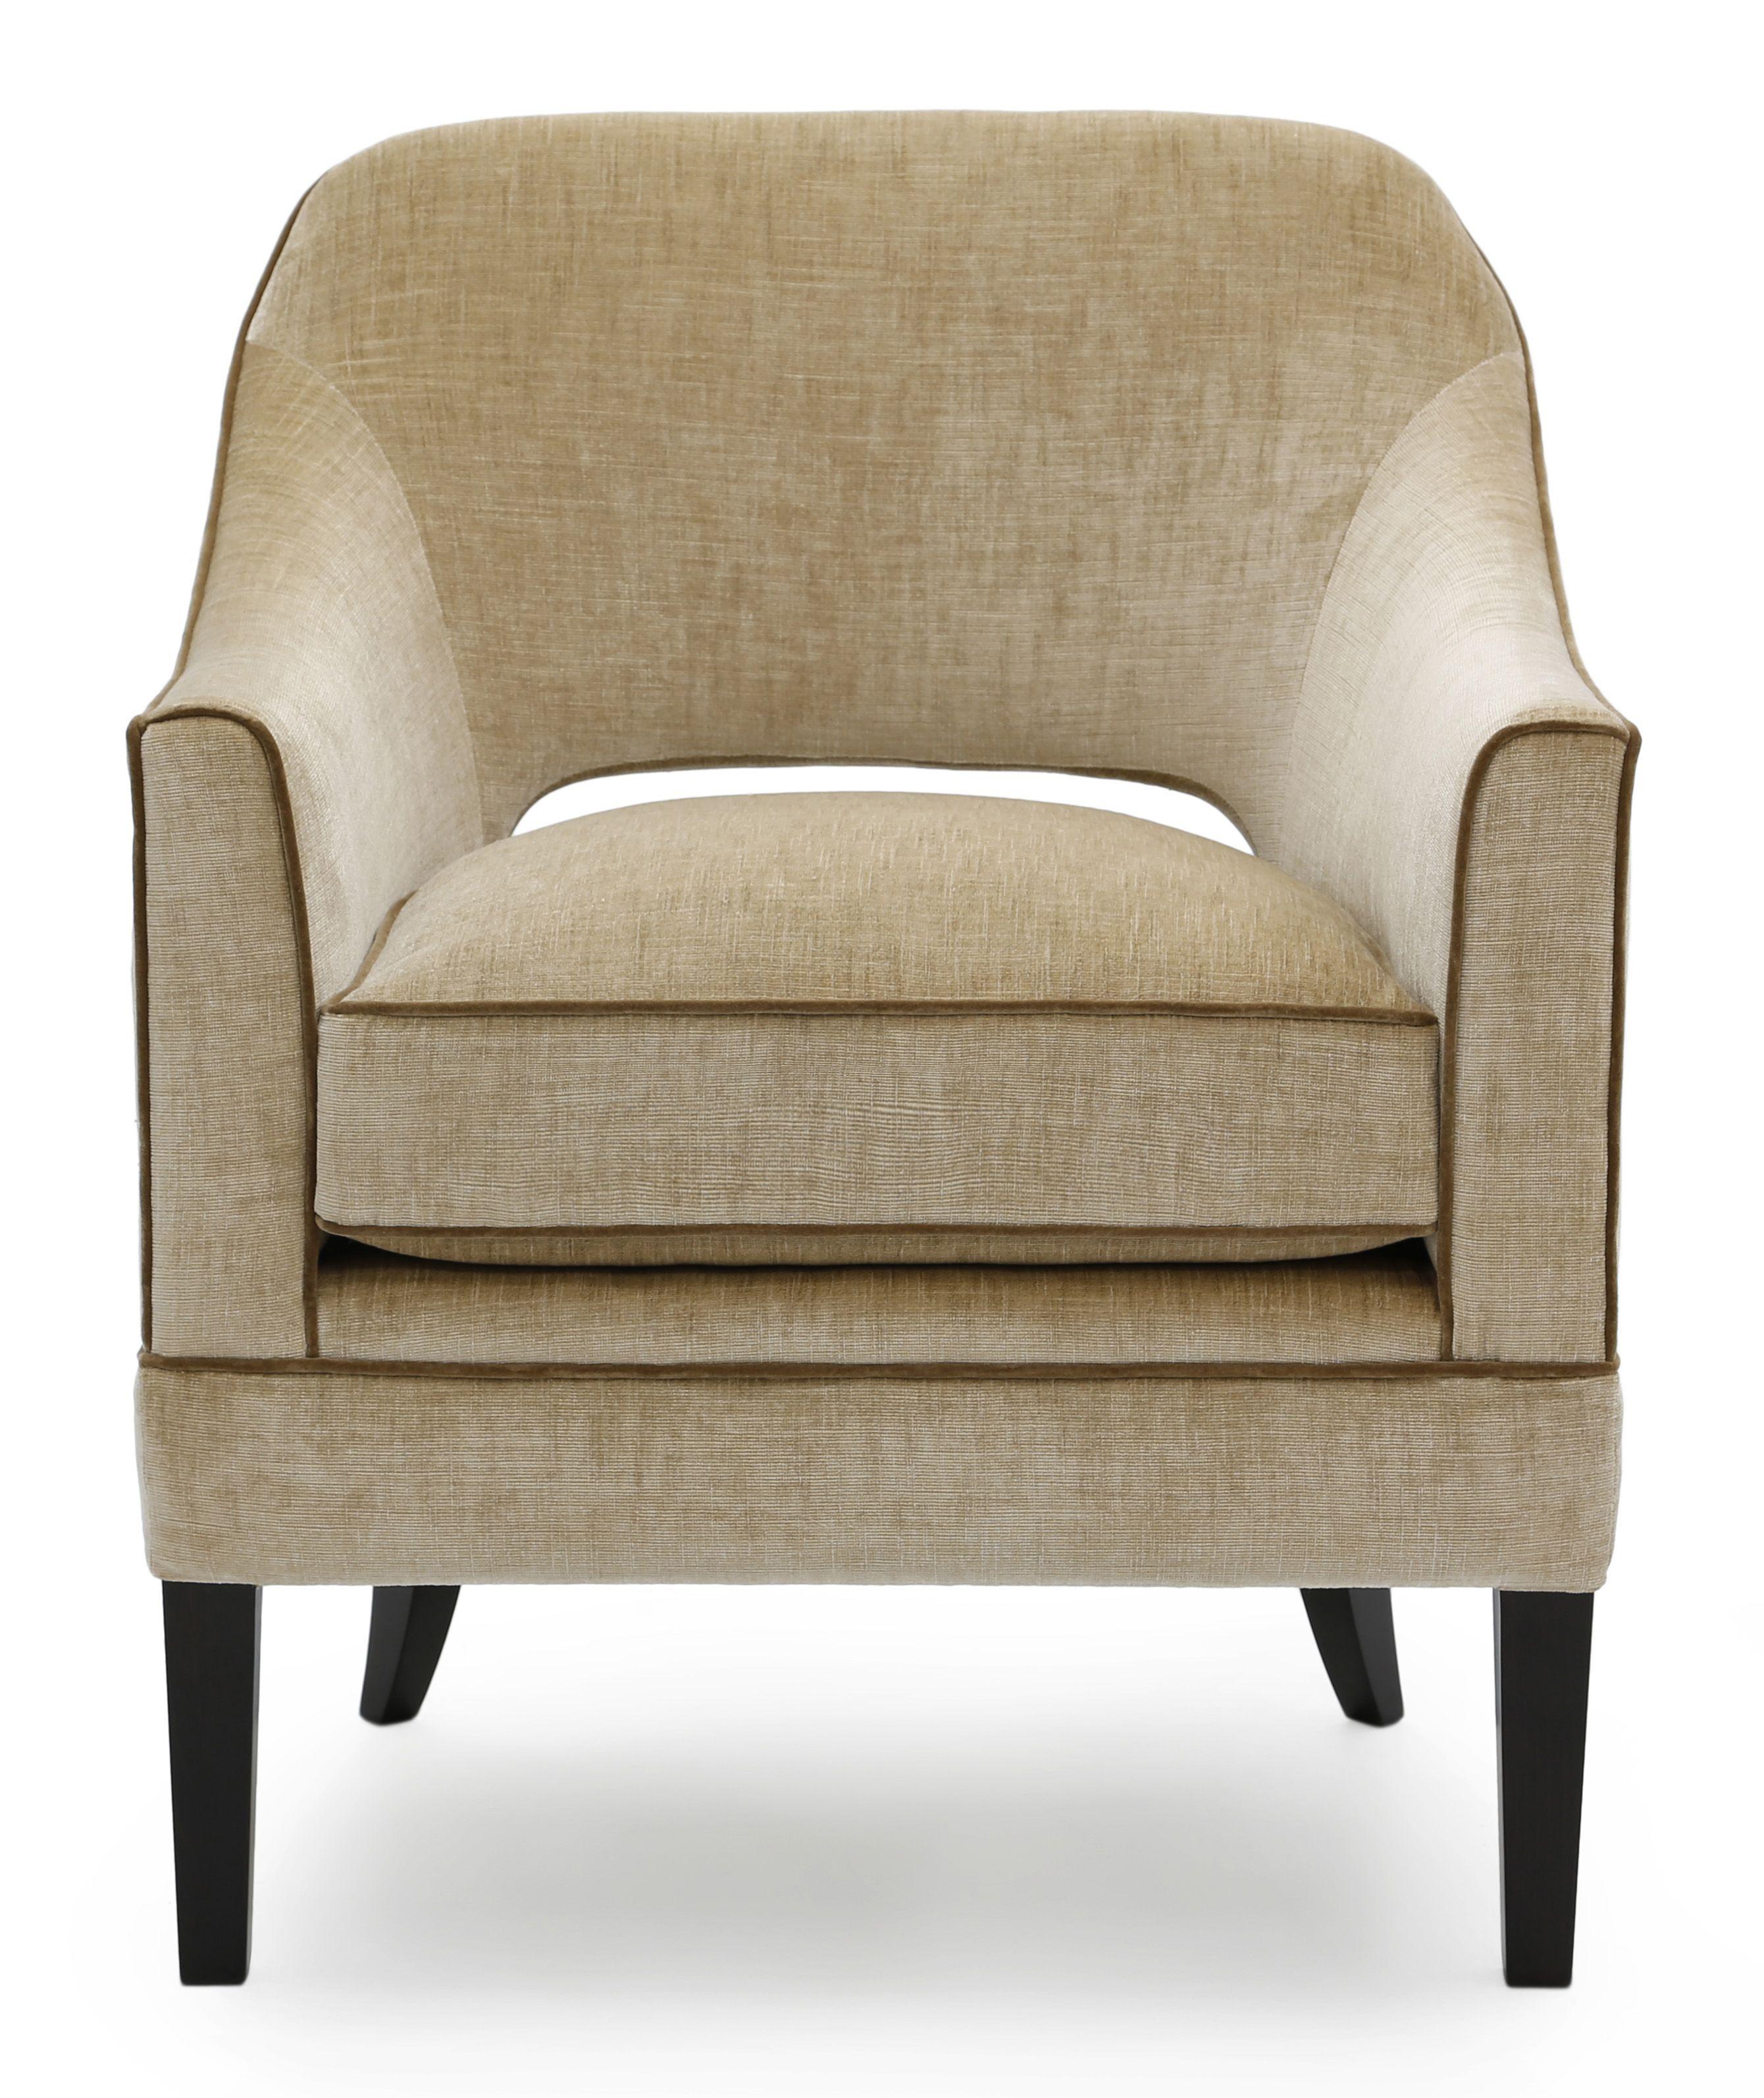 Sensational Bespoke Occasional Chairs The Sofa Chair Company Inzonedesignstudio Interior Chair Design Inzonedesignstudiocom